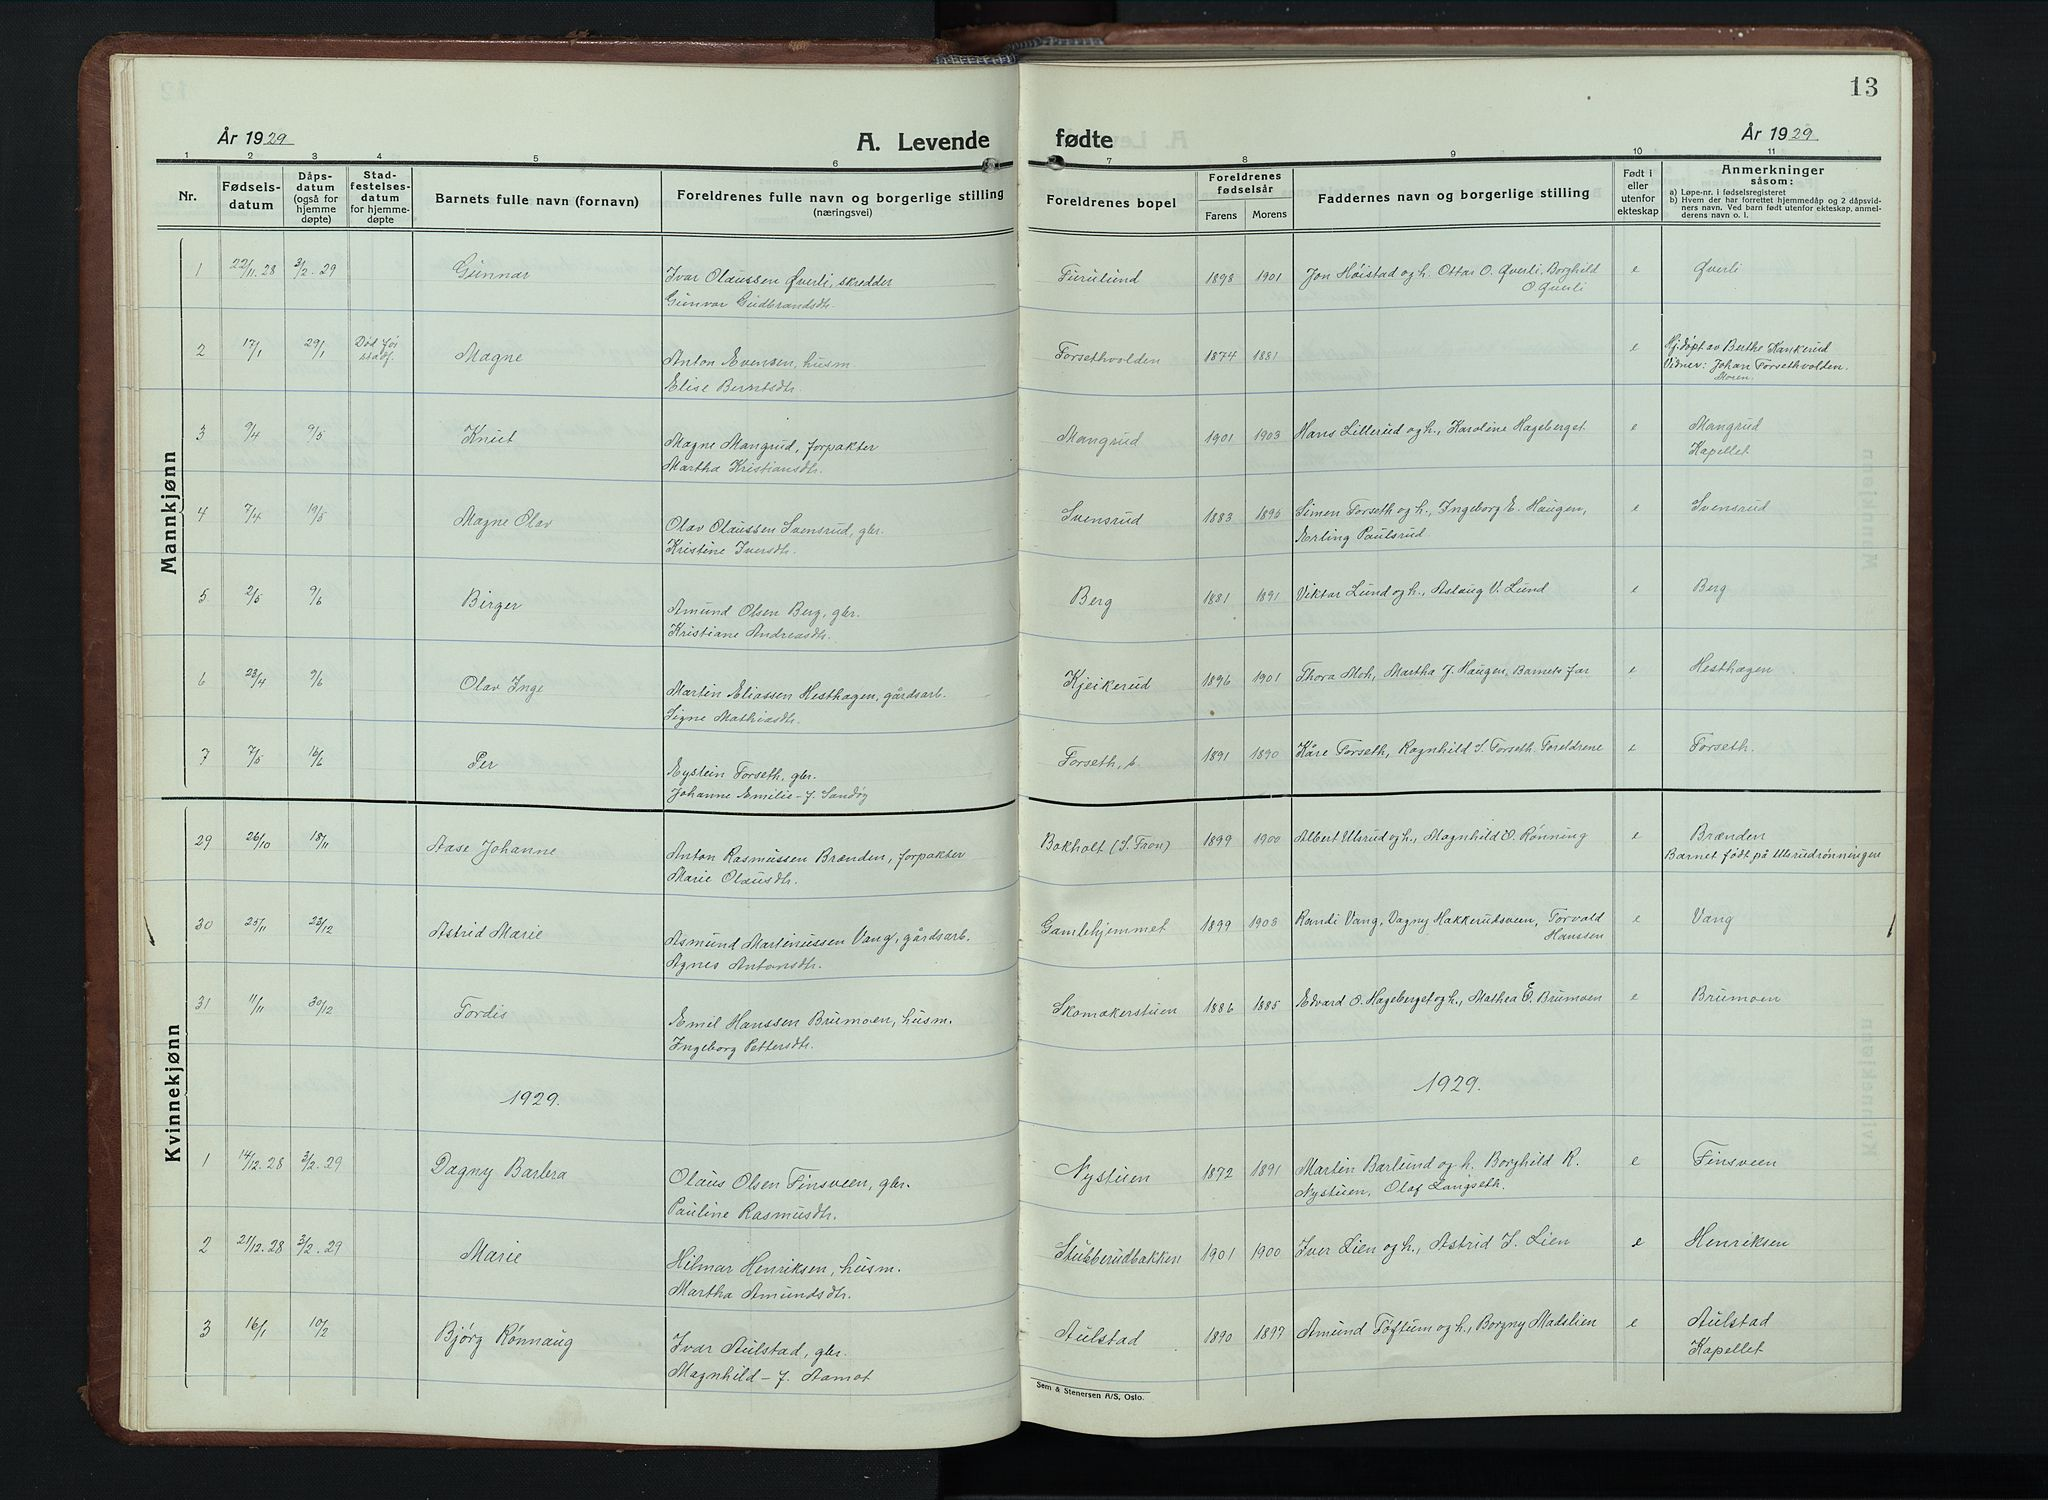 SAH, Vestre Gausdal prestekontor, Klokkerbok nr. 5, 1926-1955, s. 13